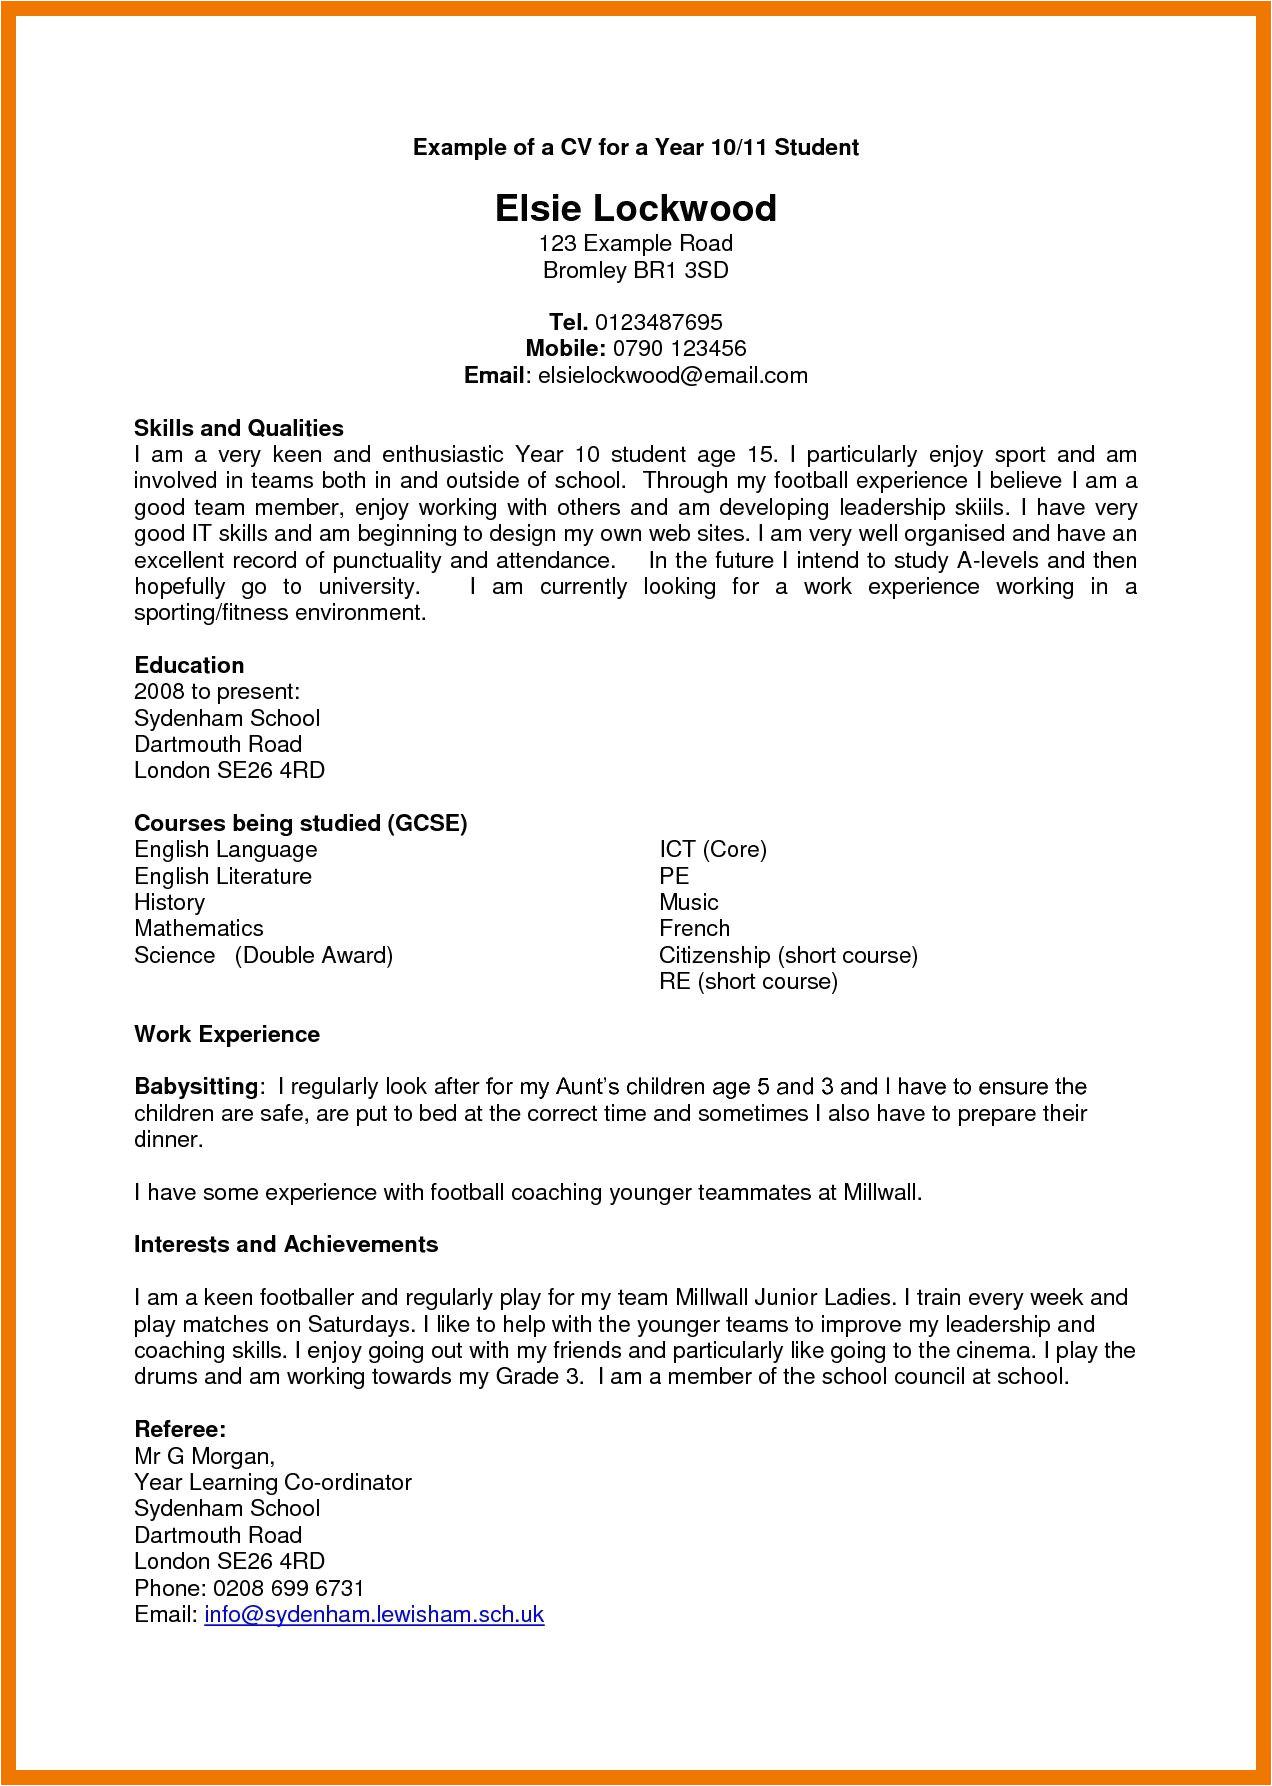 Year 11 Student Resume Cv Template Year 11 Cv Template Resume Examples Cv